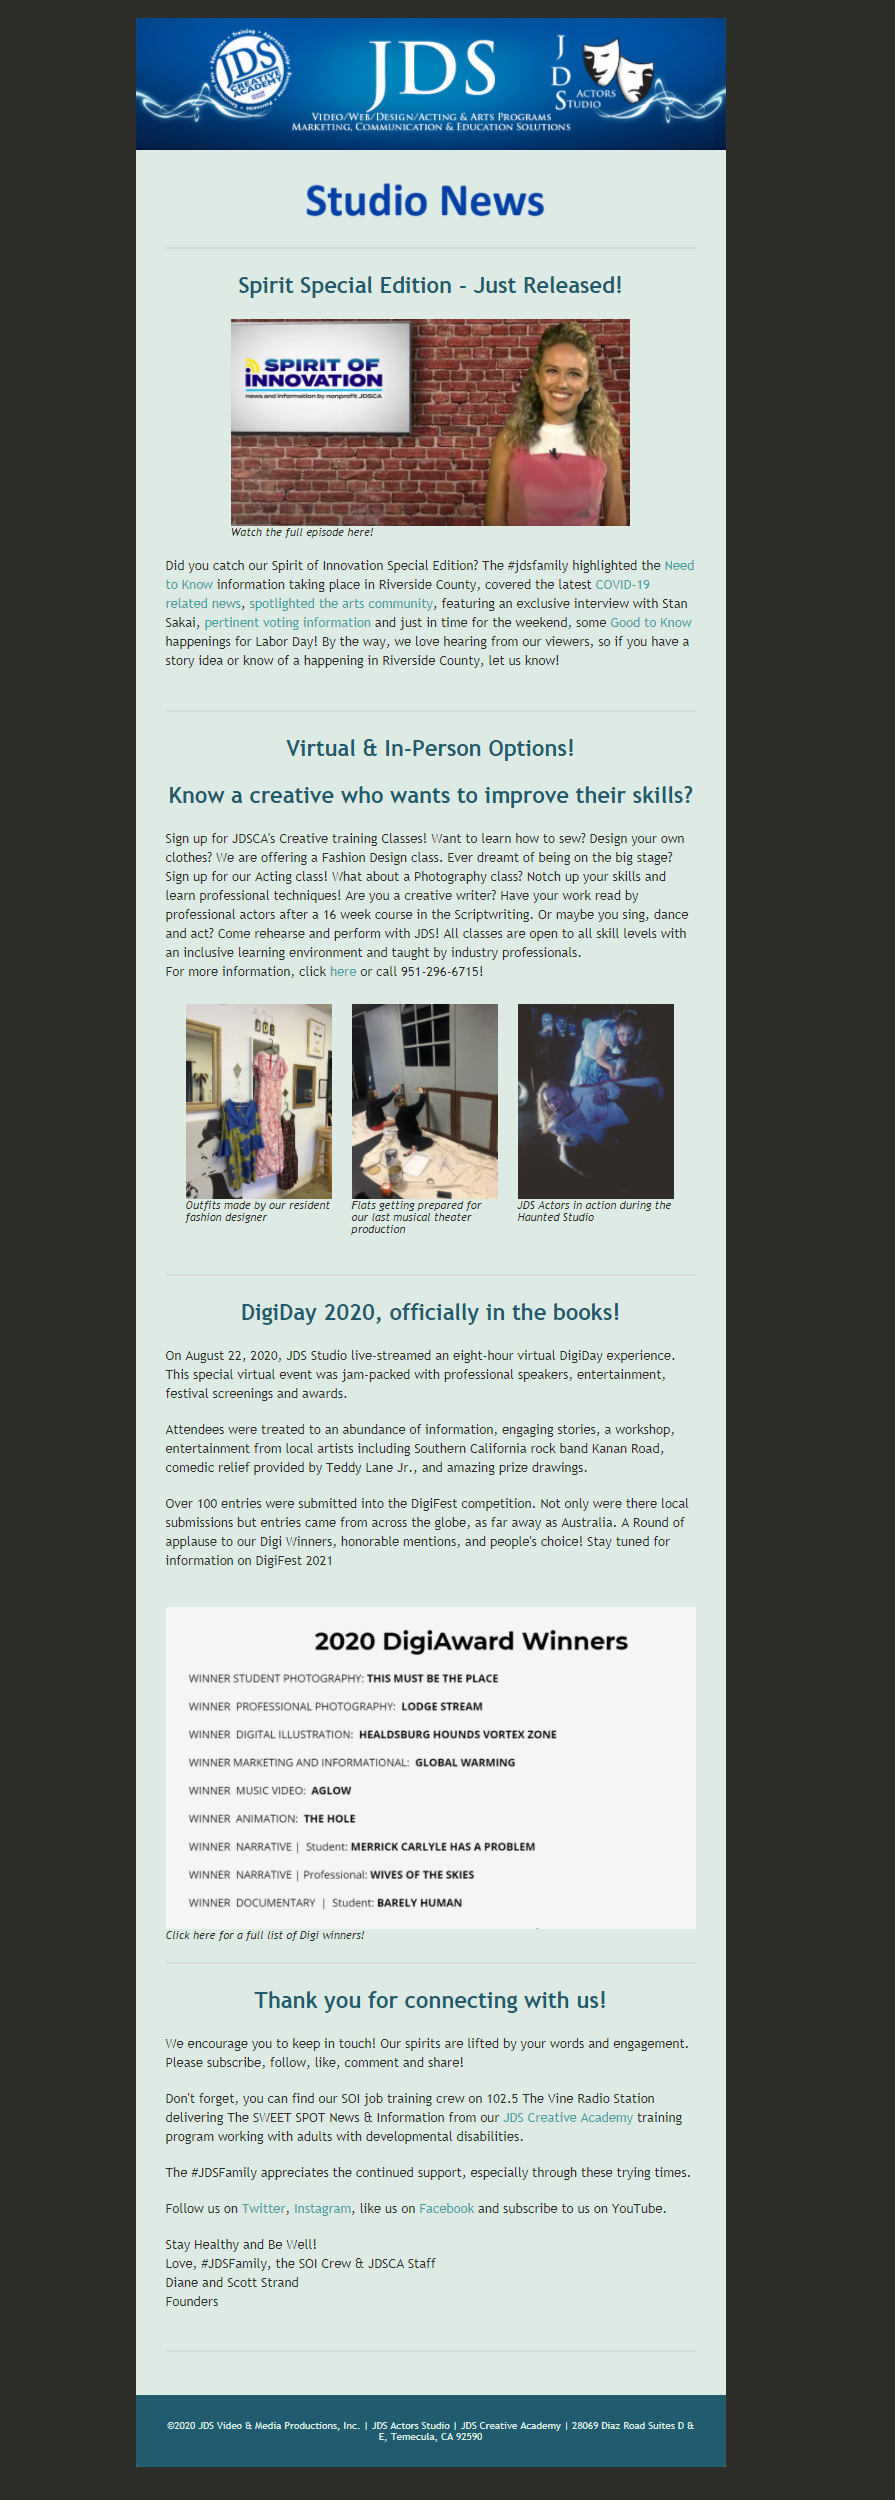 JDS Studio News September 2020